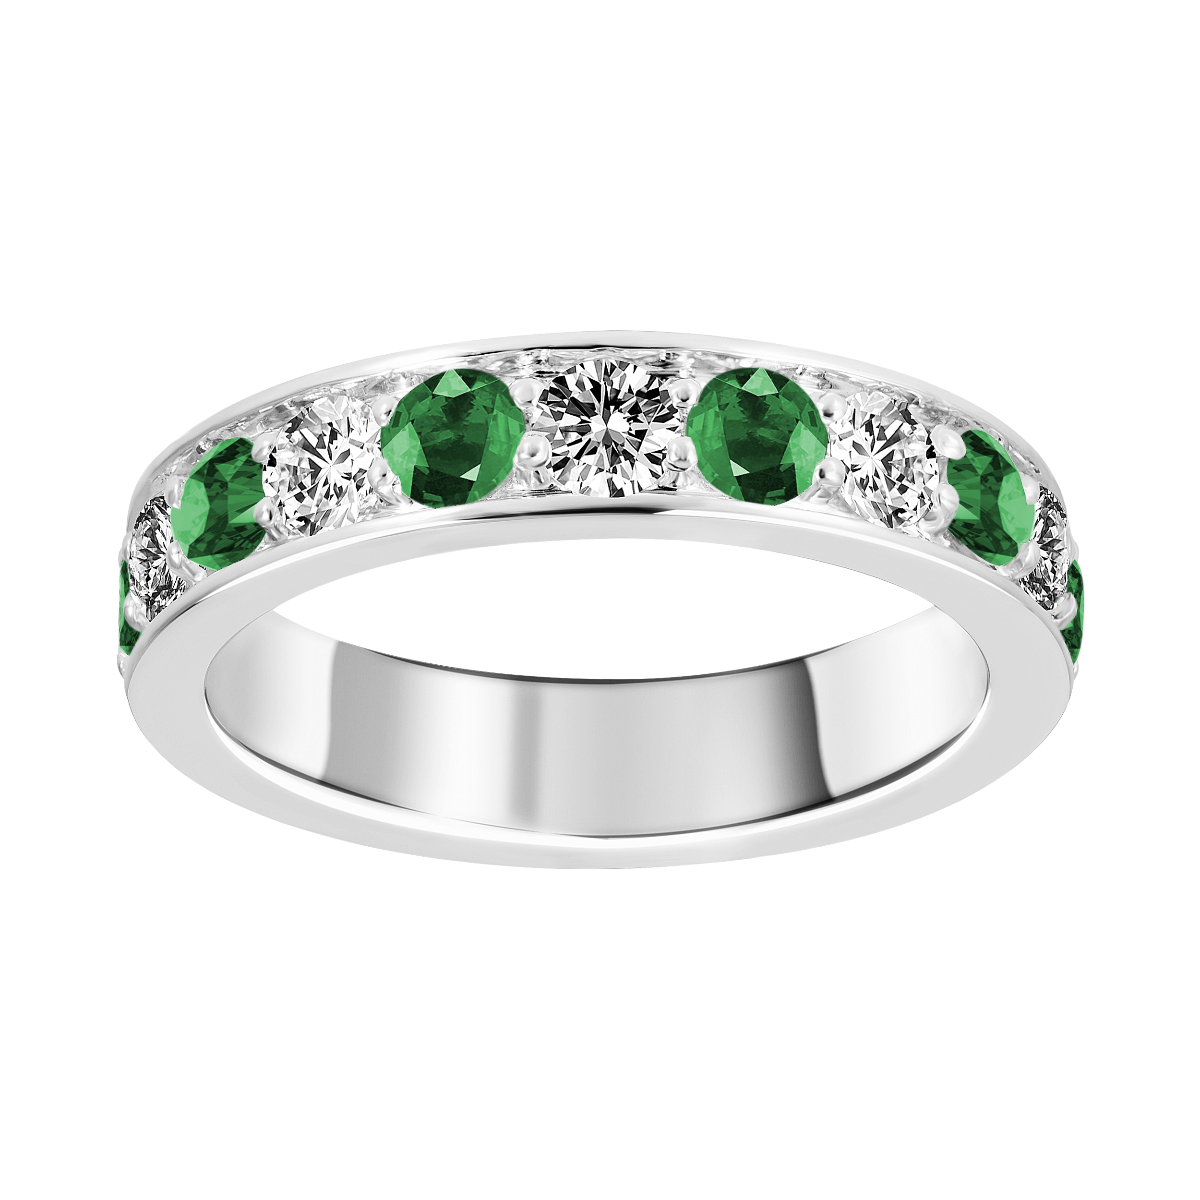 Anel de esmeralda e diamantes ouro branco